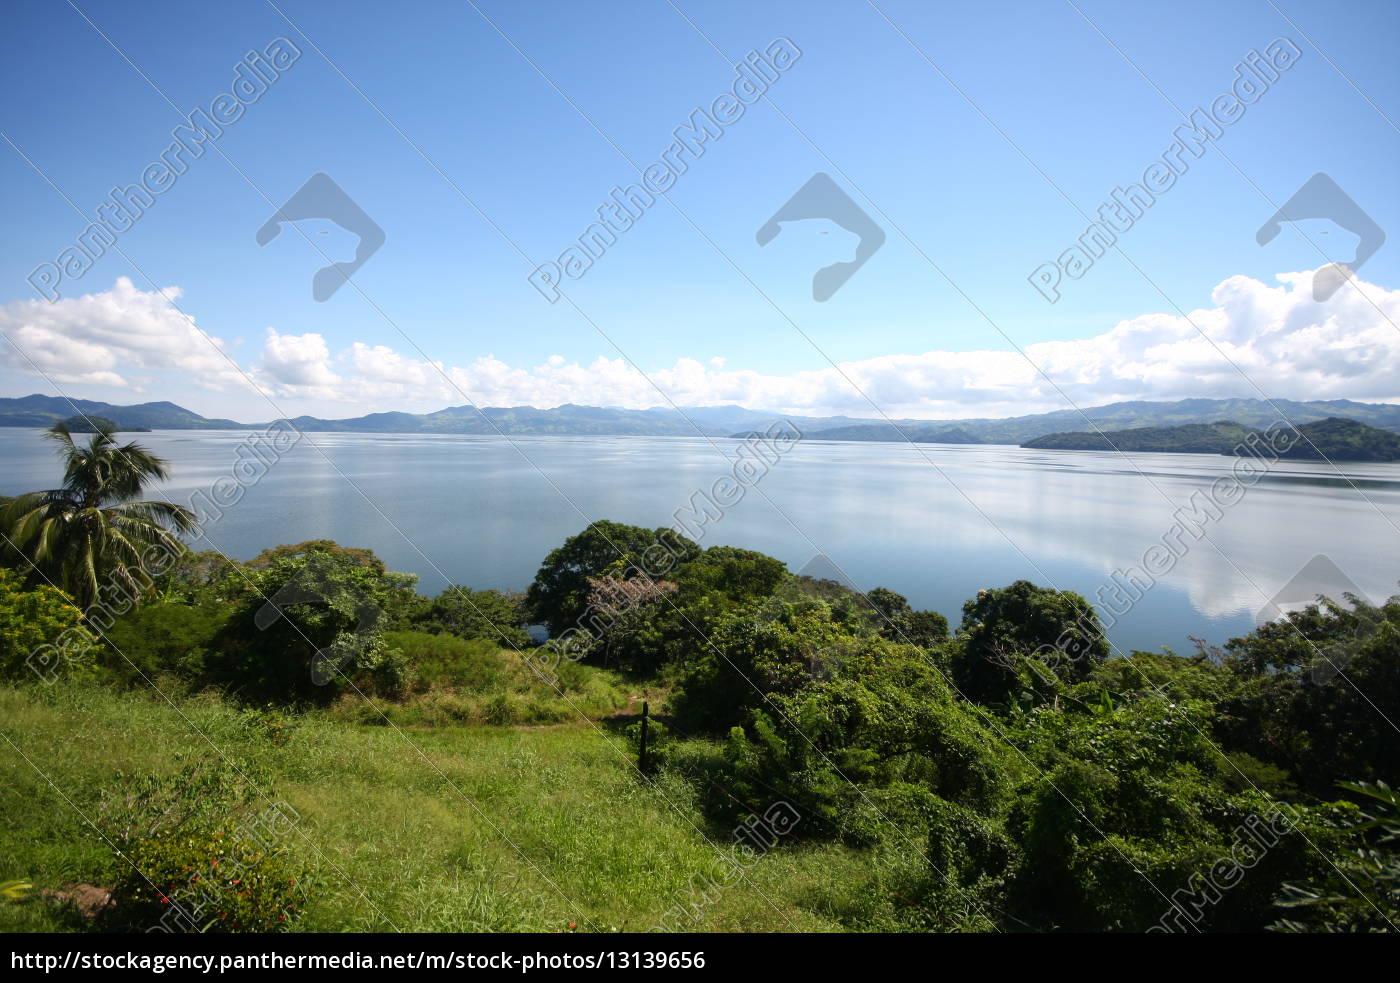 Mexiko, See, Gewässer, Himmel, Wolken, Panorama - 13139656